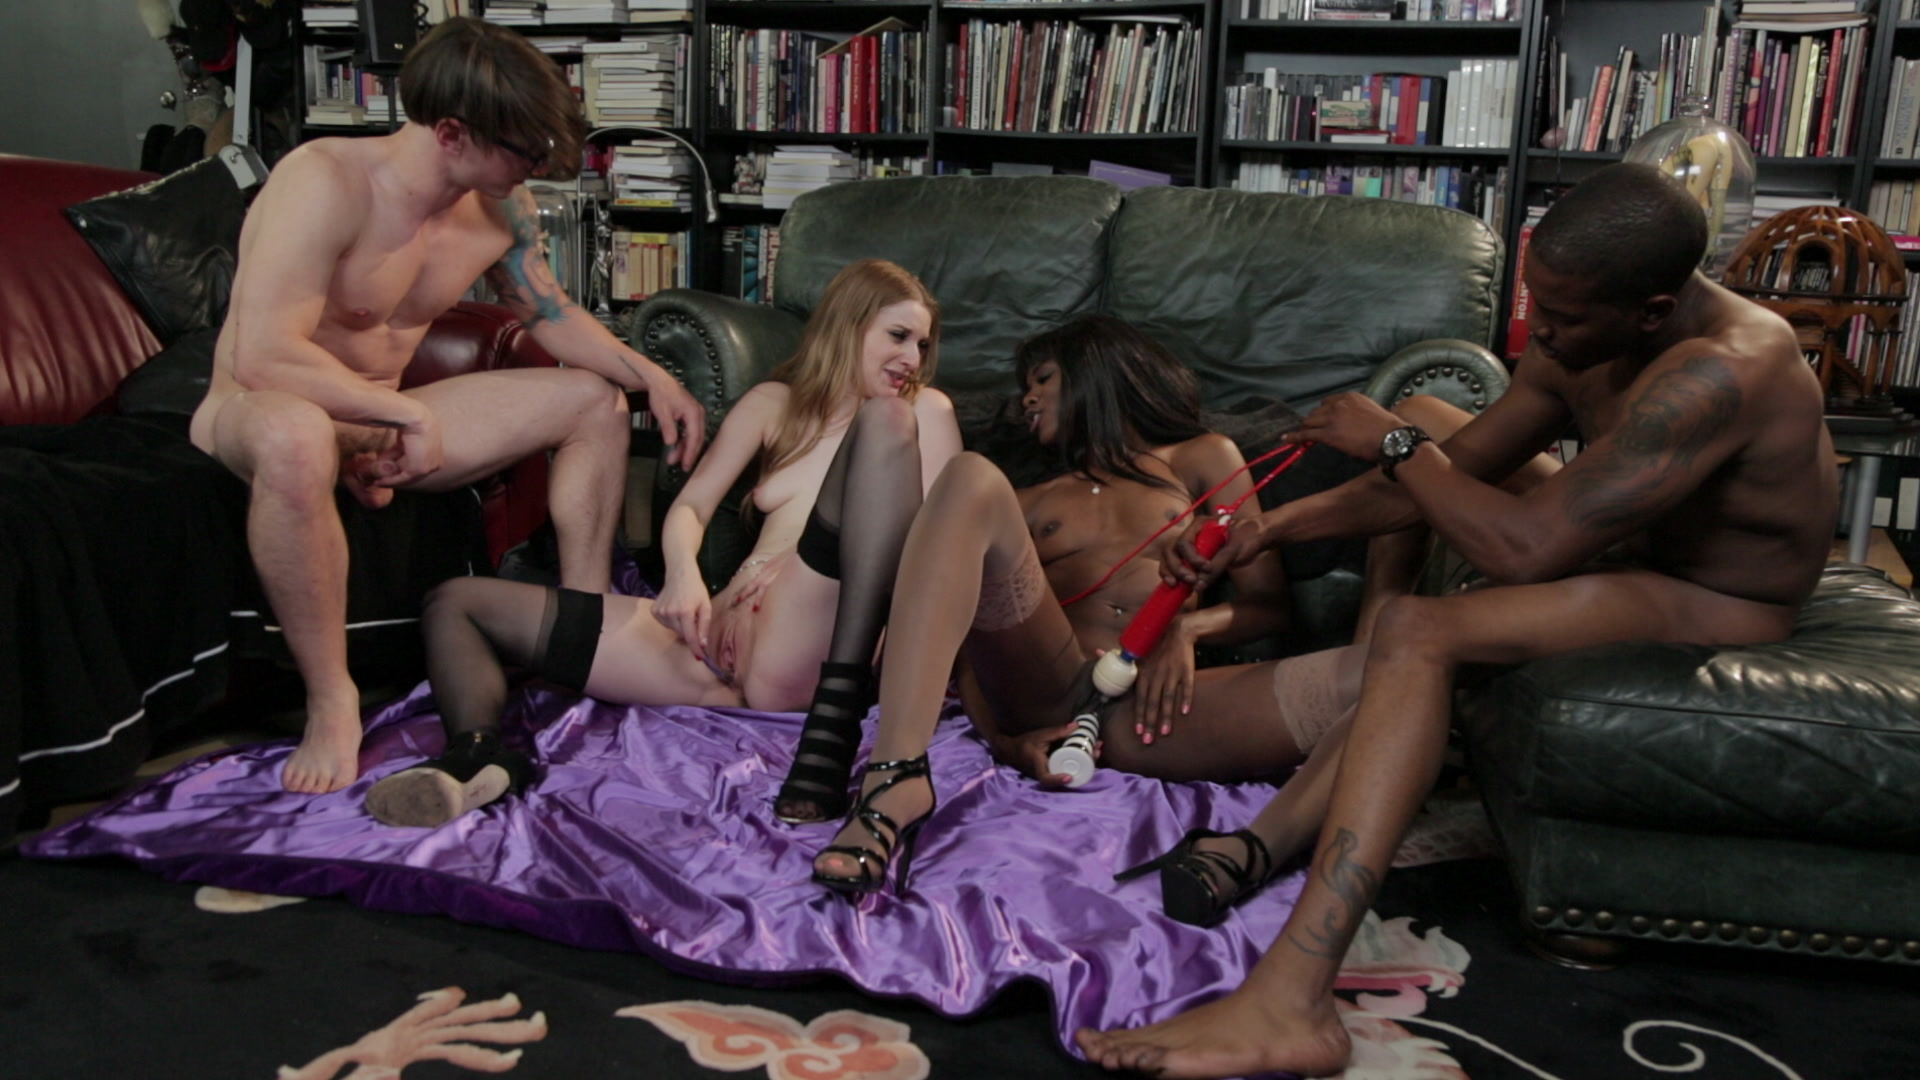 Nina Hartleys Guide To Exploring Open Relationships 2015 Videos